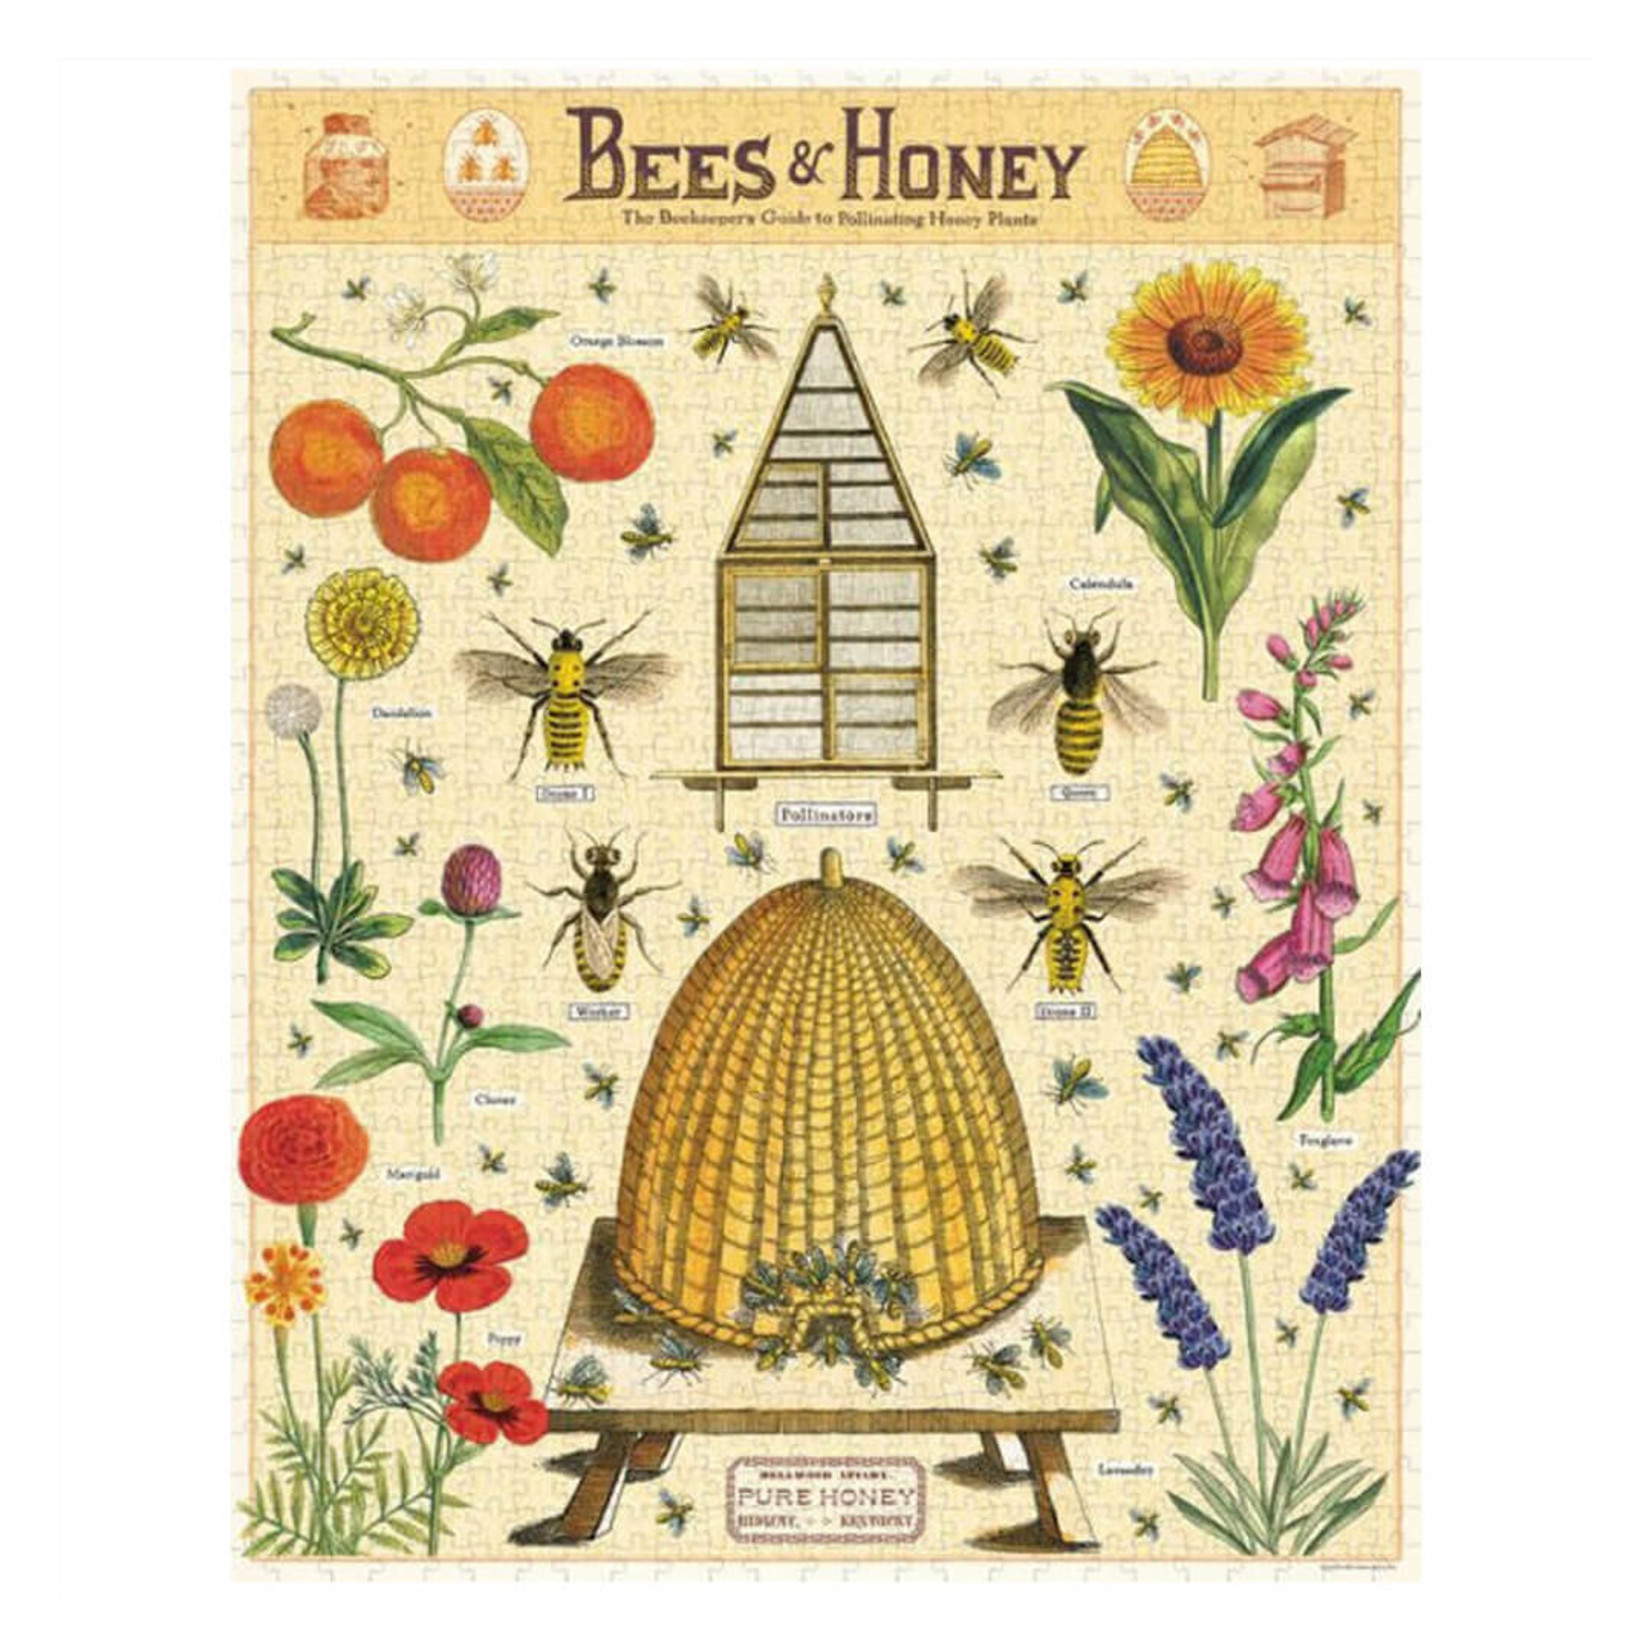 Cavallini & Co. 1000 Pc. Puzzle — Bees & Honey